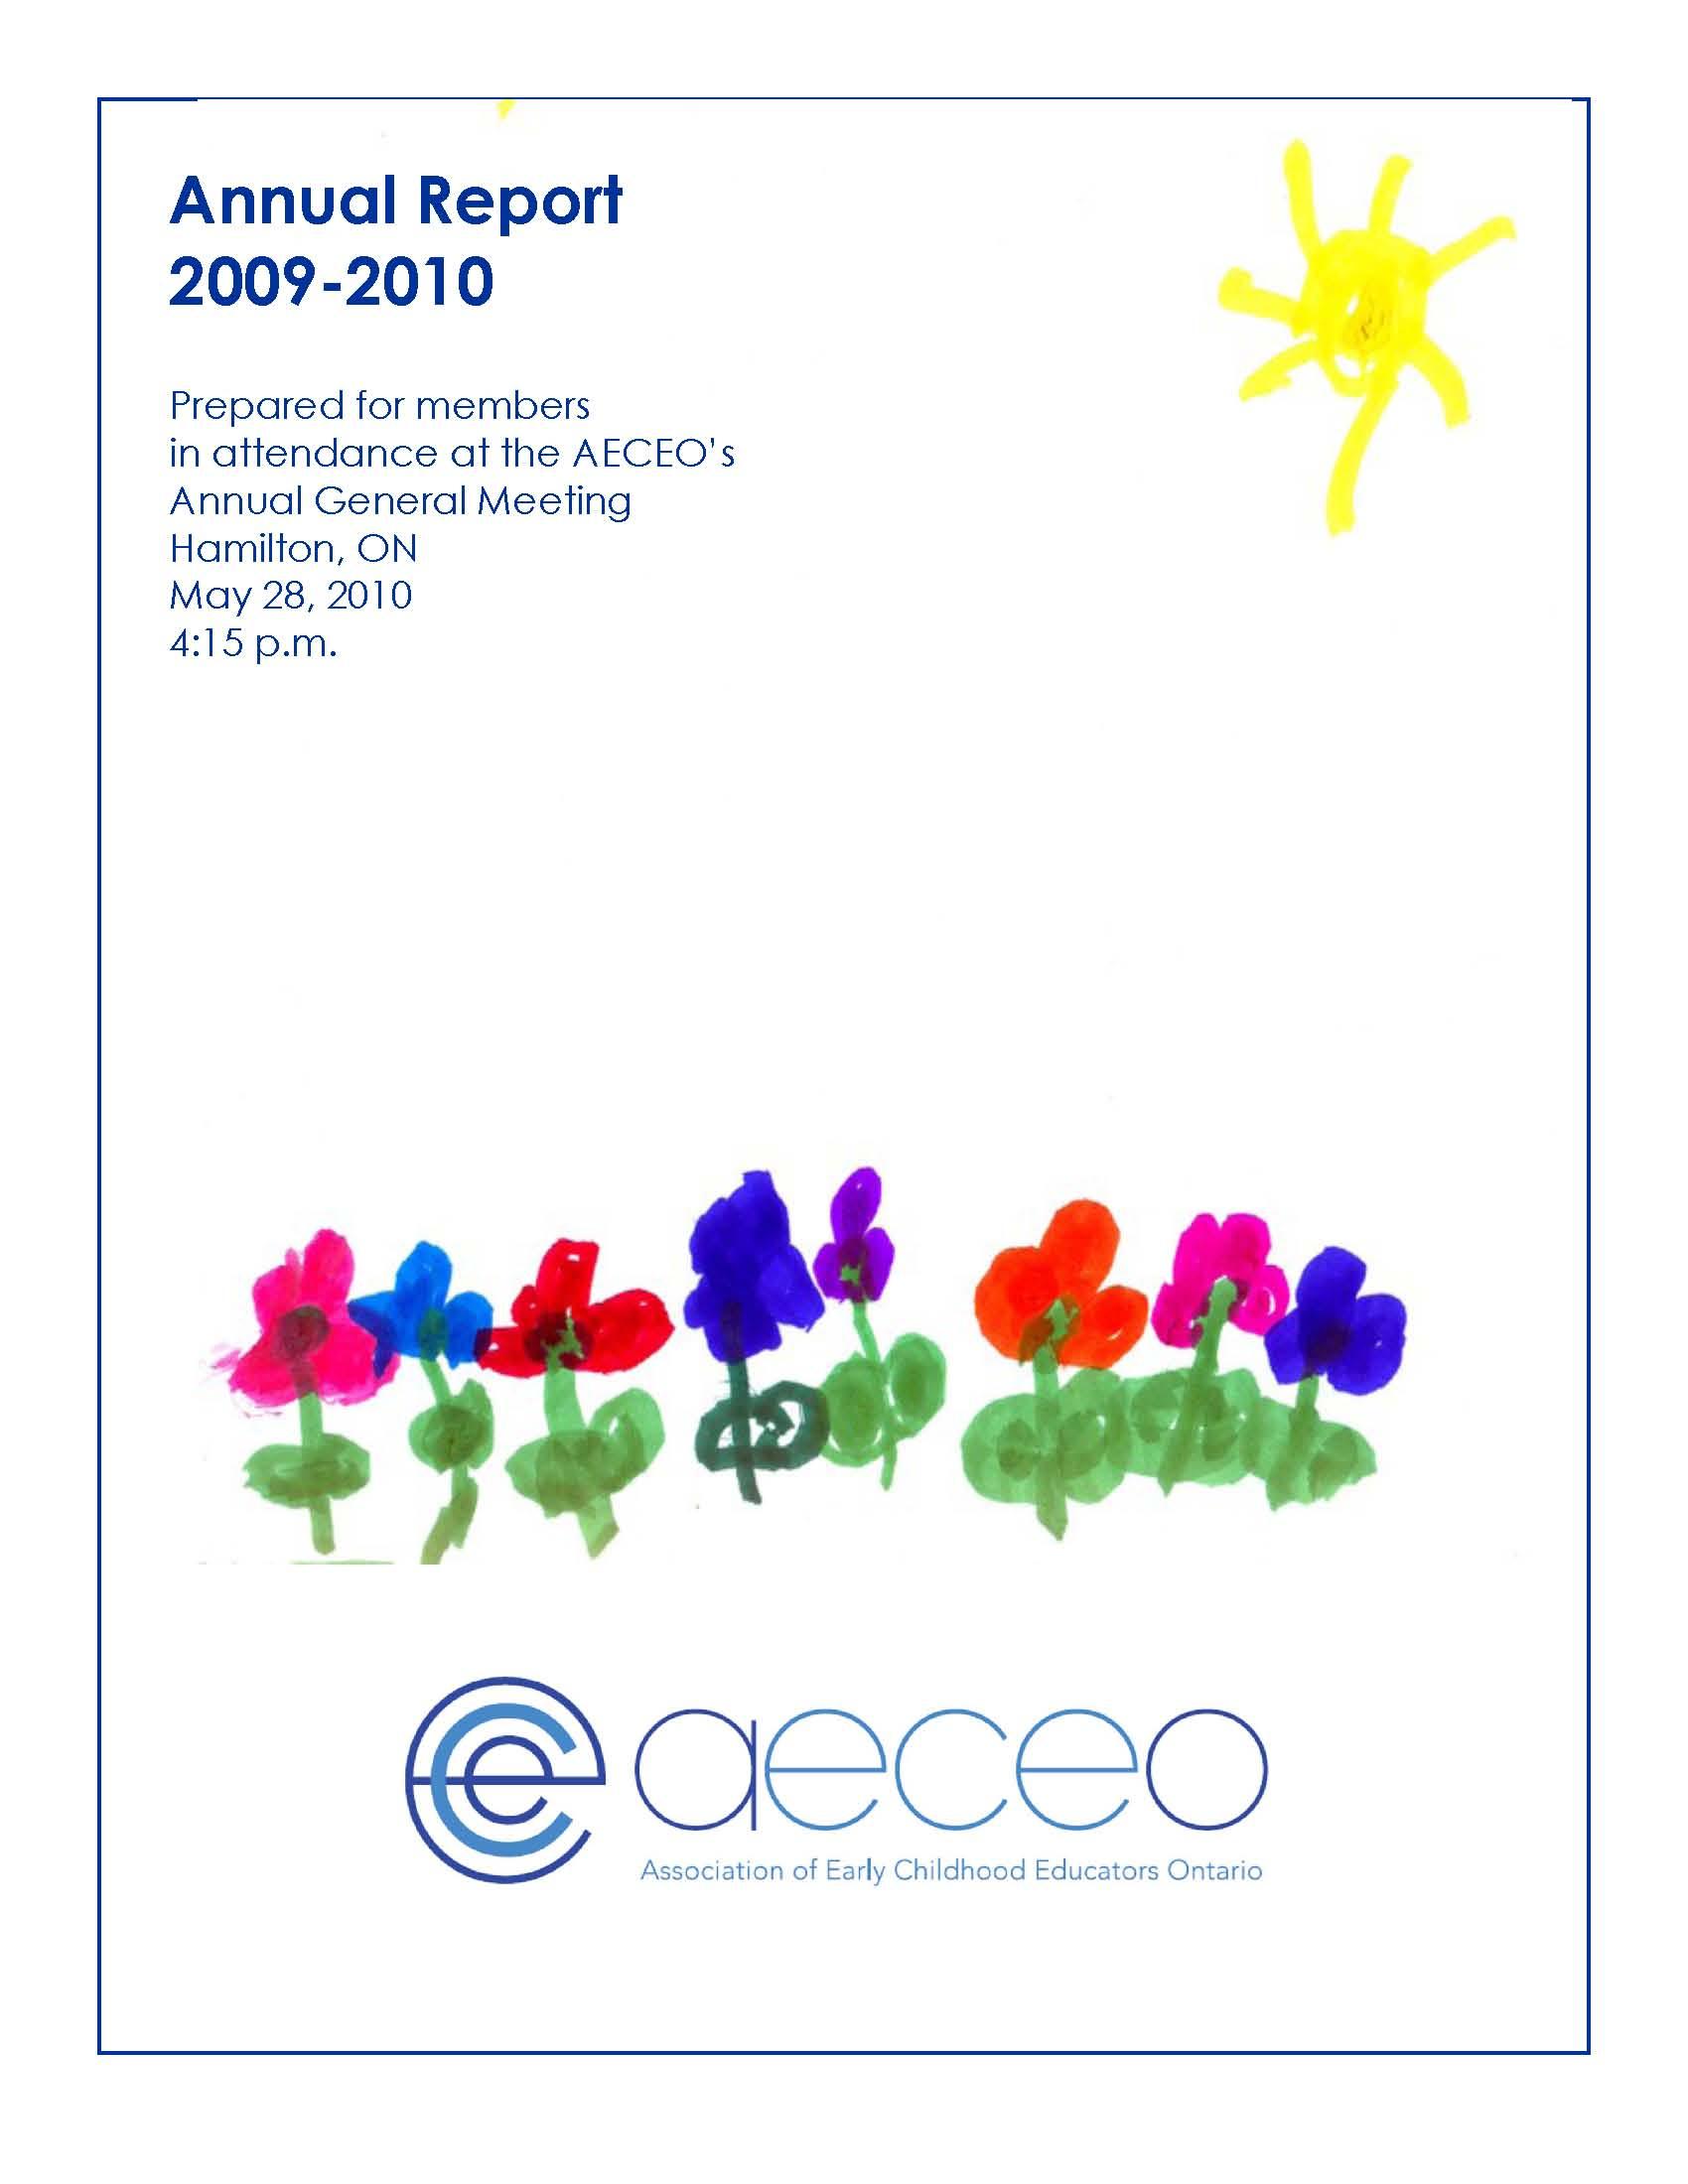 Annual_Report_2009-2010_1.jpg